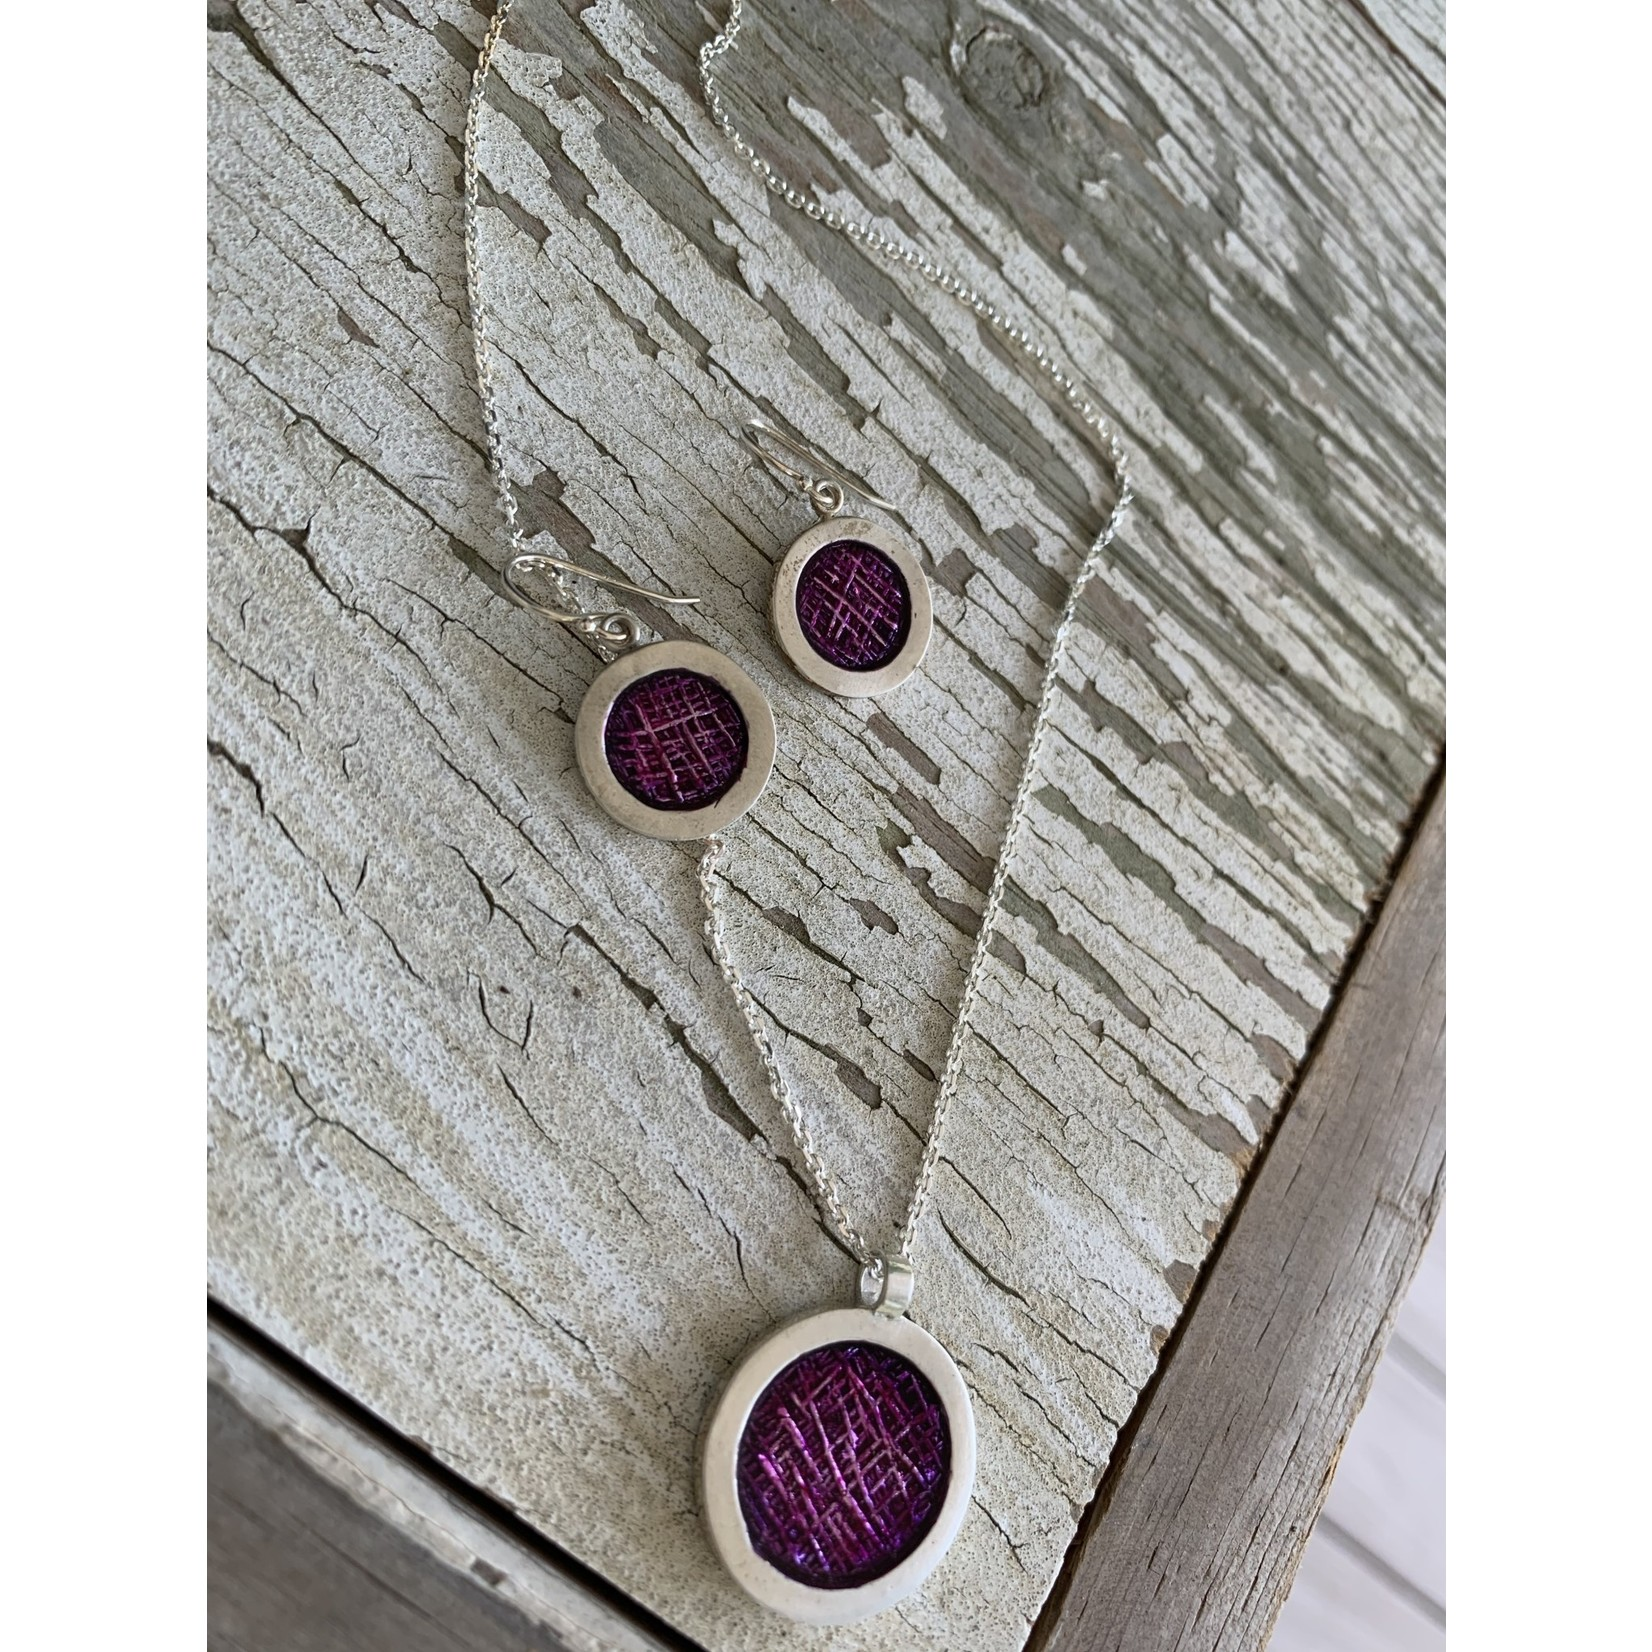 Liz Sabol Liz Sabol | Candy Crosshatch Magenta Earrings #LS-10353